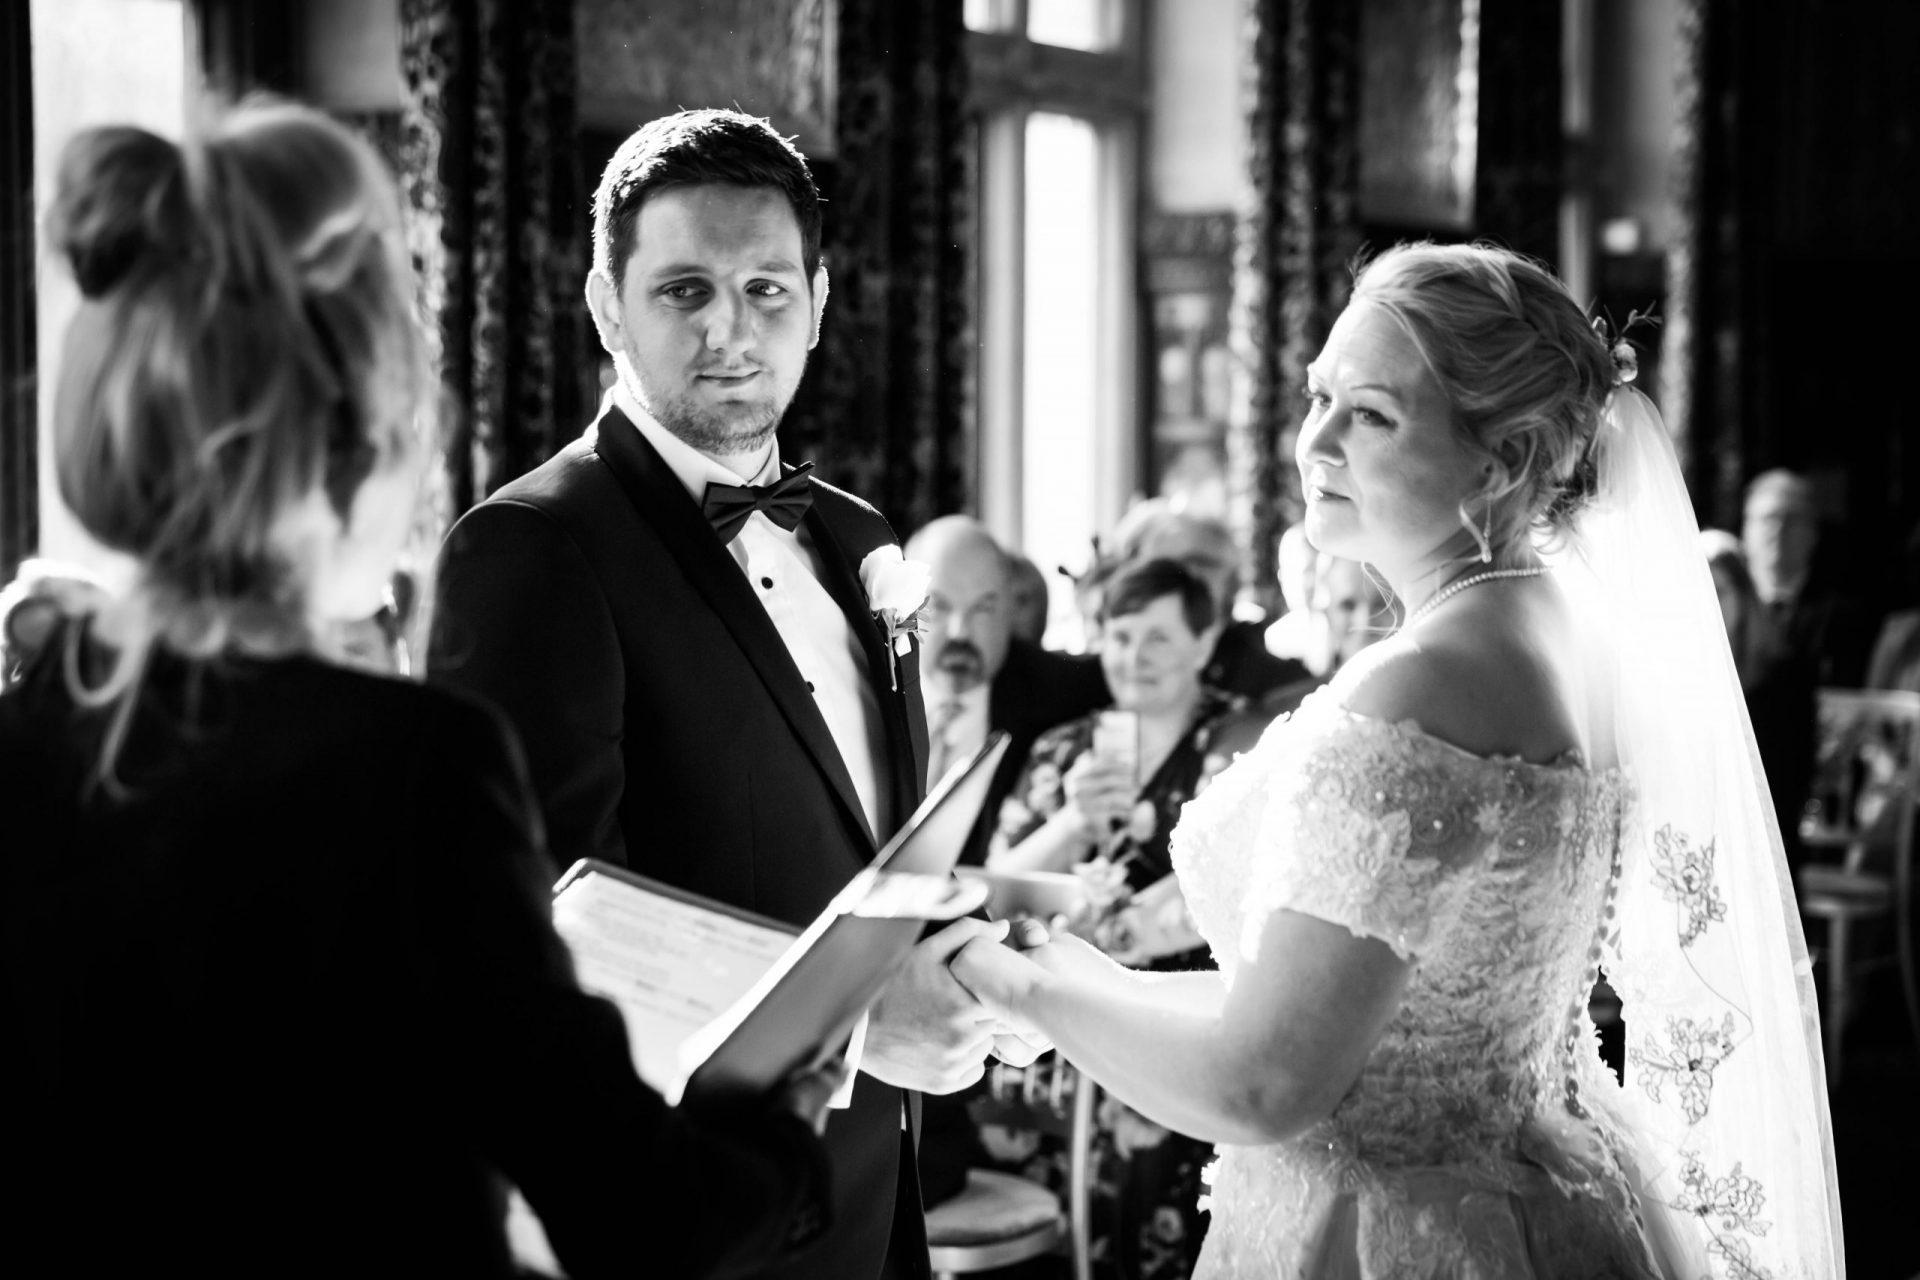 Wedding Photopgrapher in Yorkshire